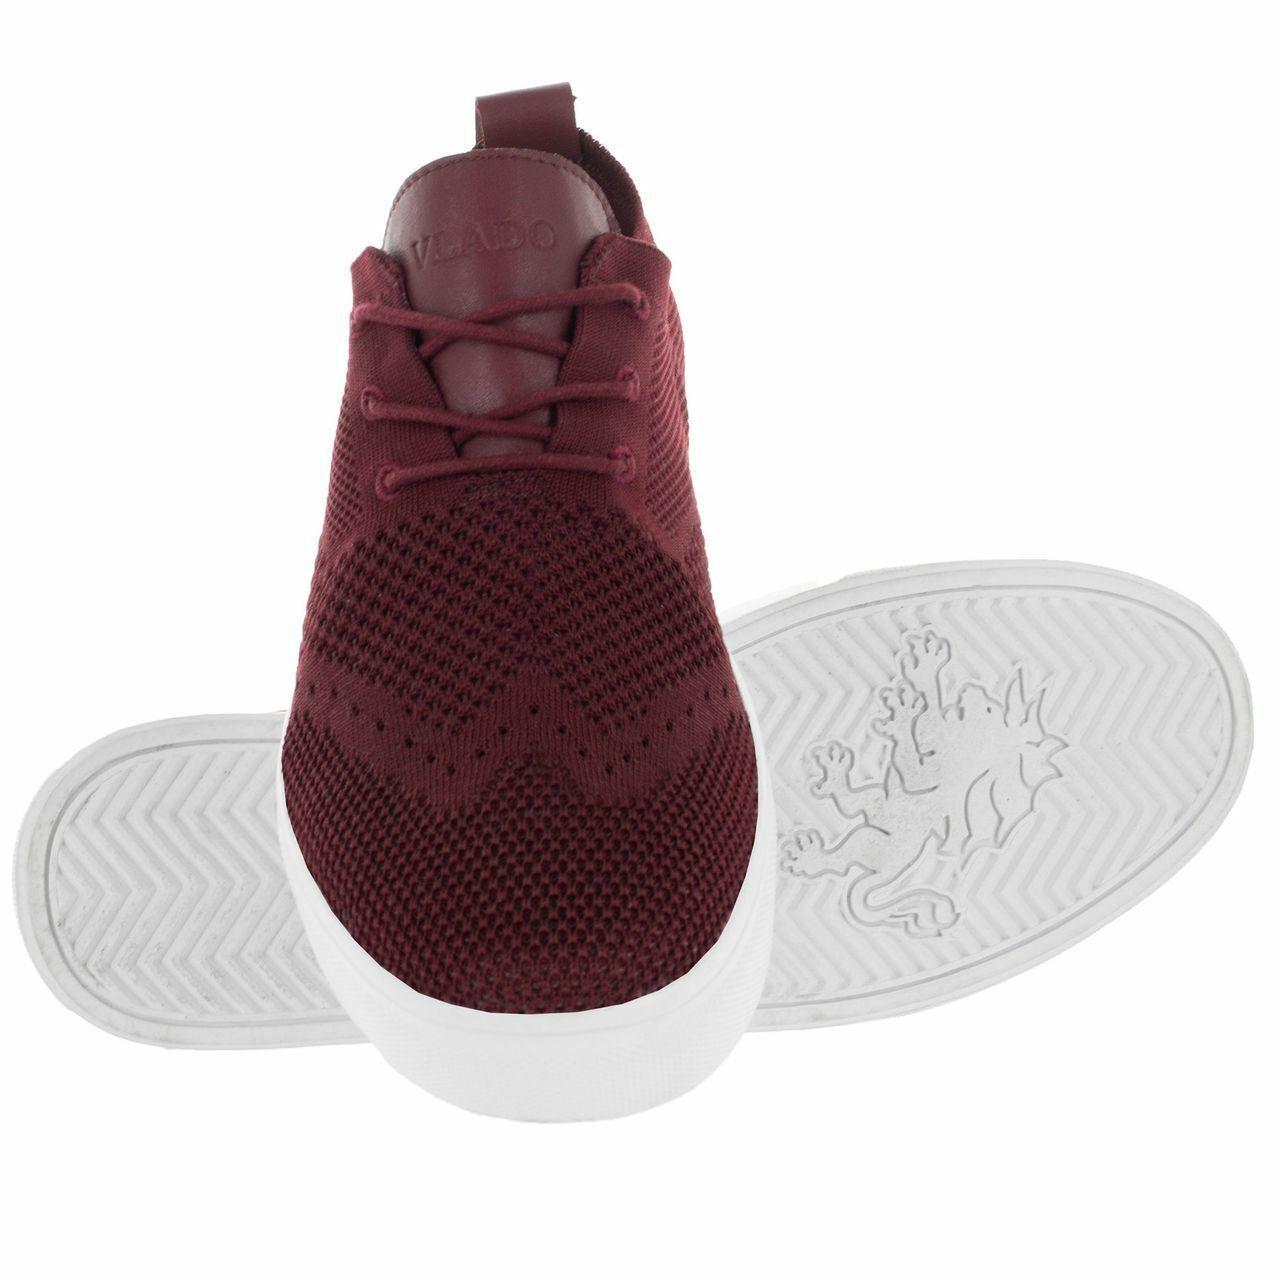 Vlado Footwear Men's Venice Low-Top shoes Burgundy IG-800-15